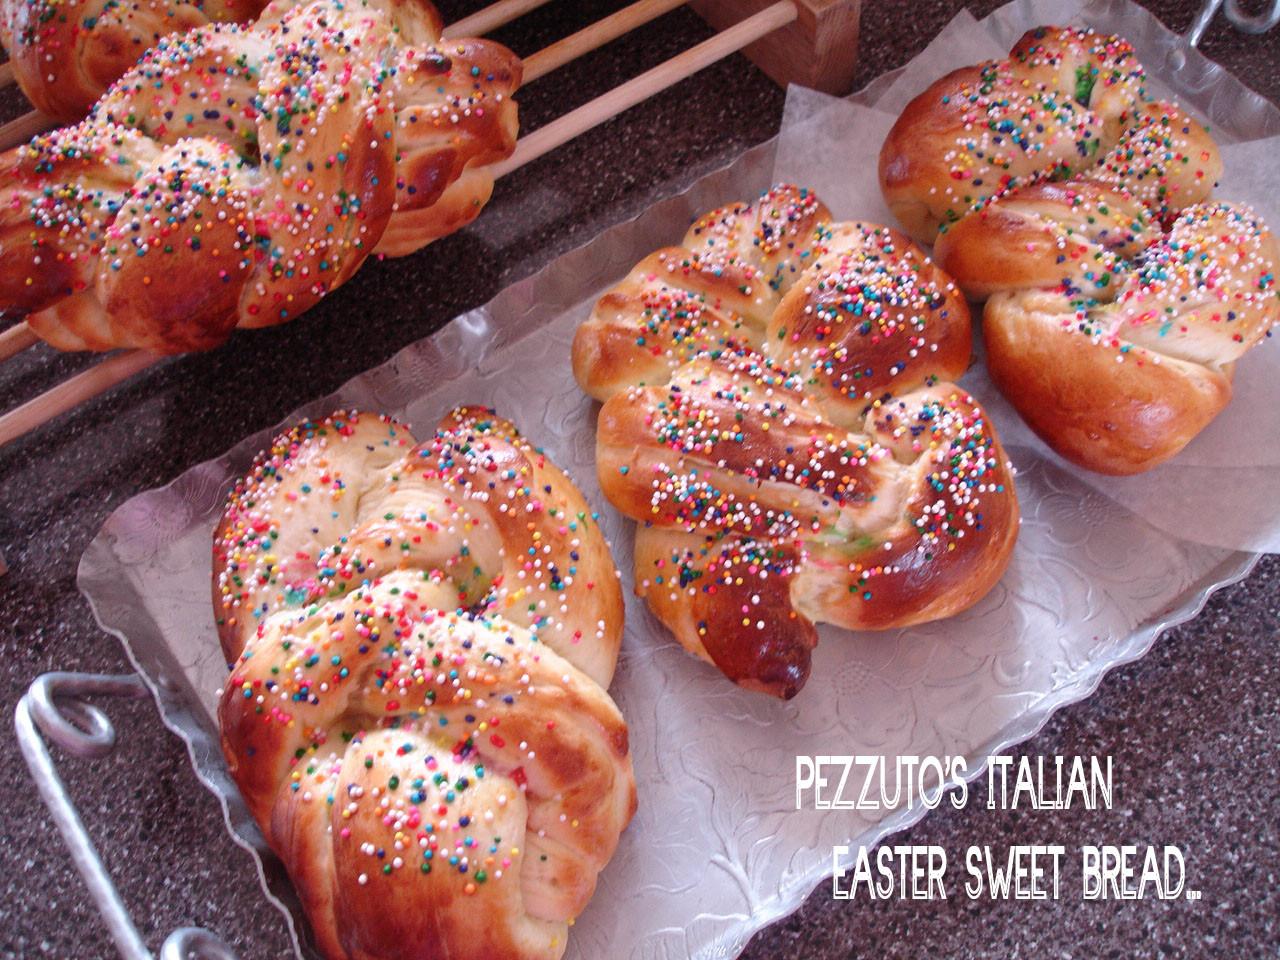 Sweet Italian Easter Bread  ChiPPy SHaBBy PeePs & Pezzuto s Italian Easter